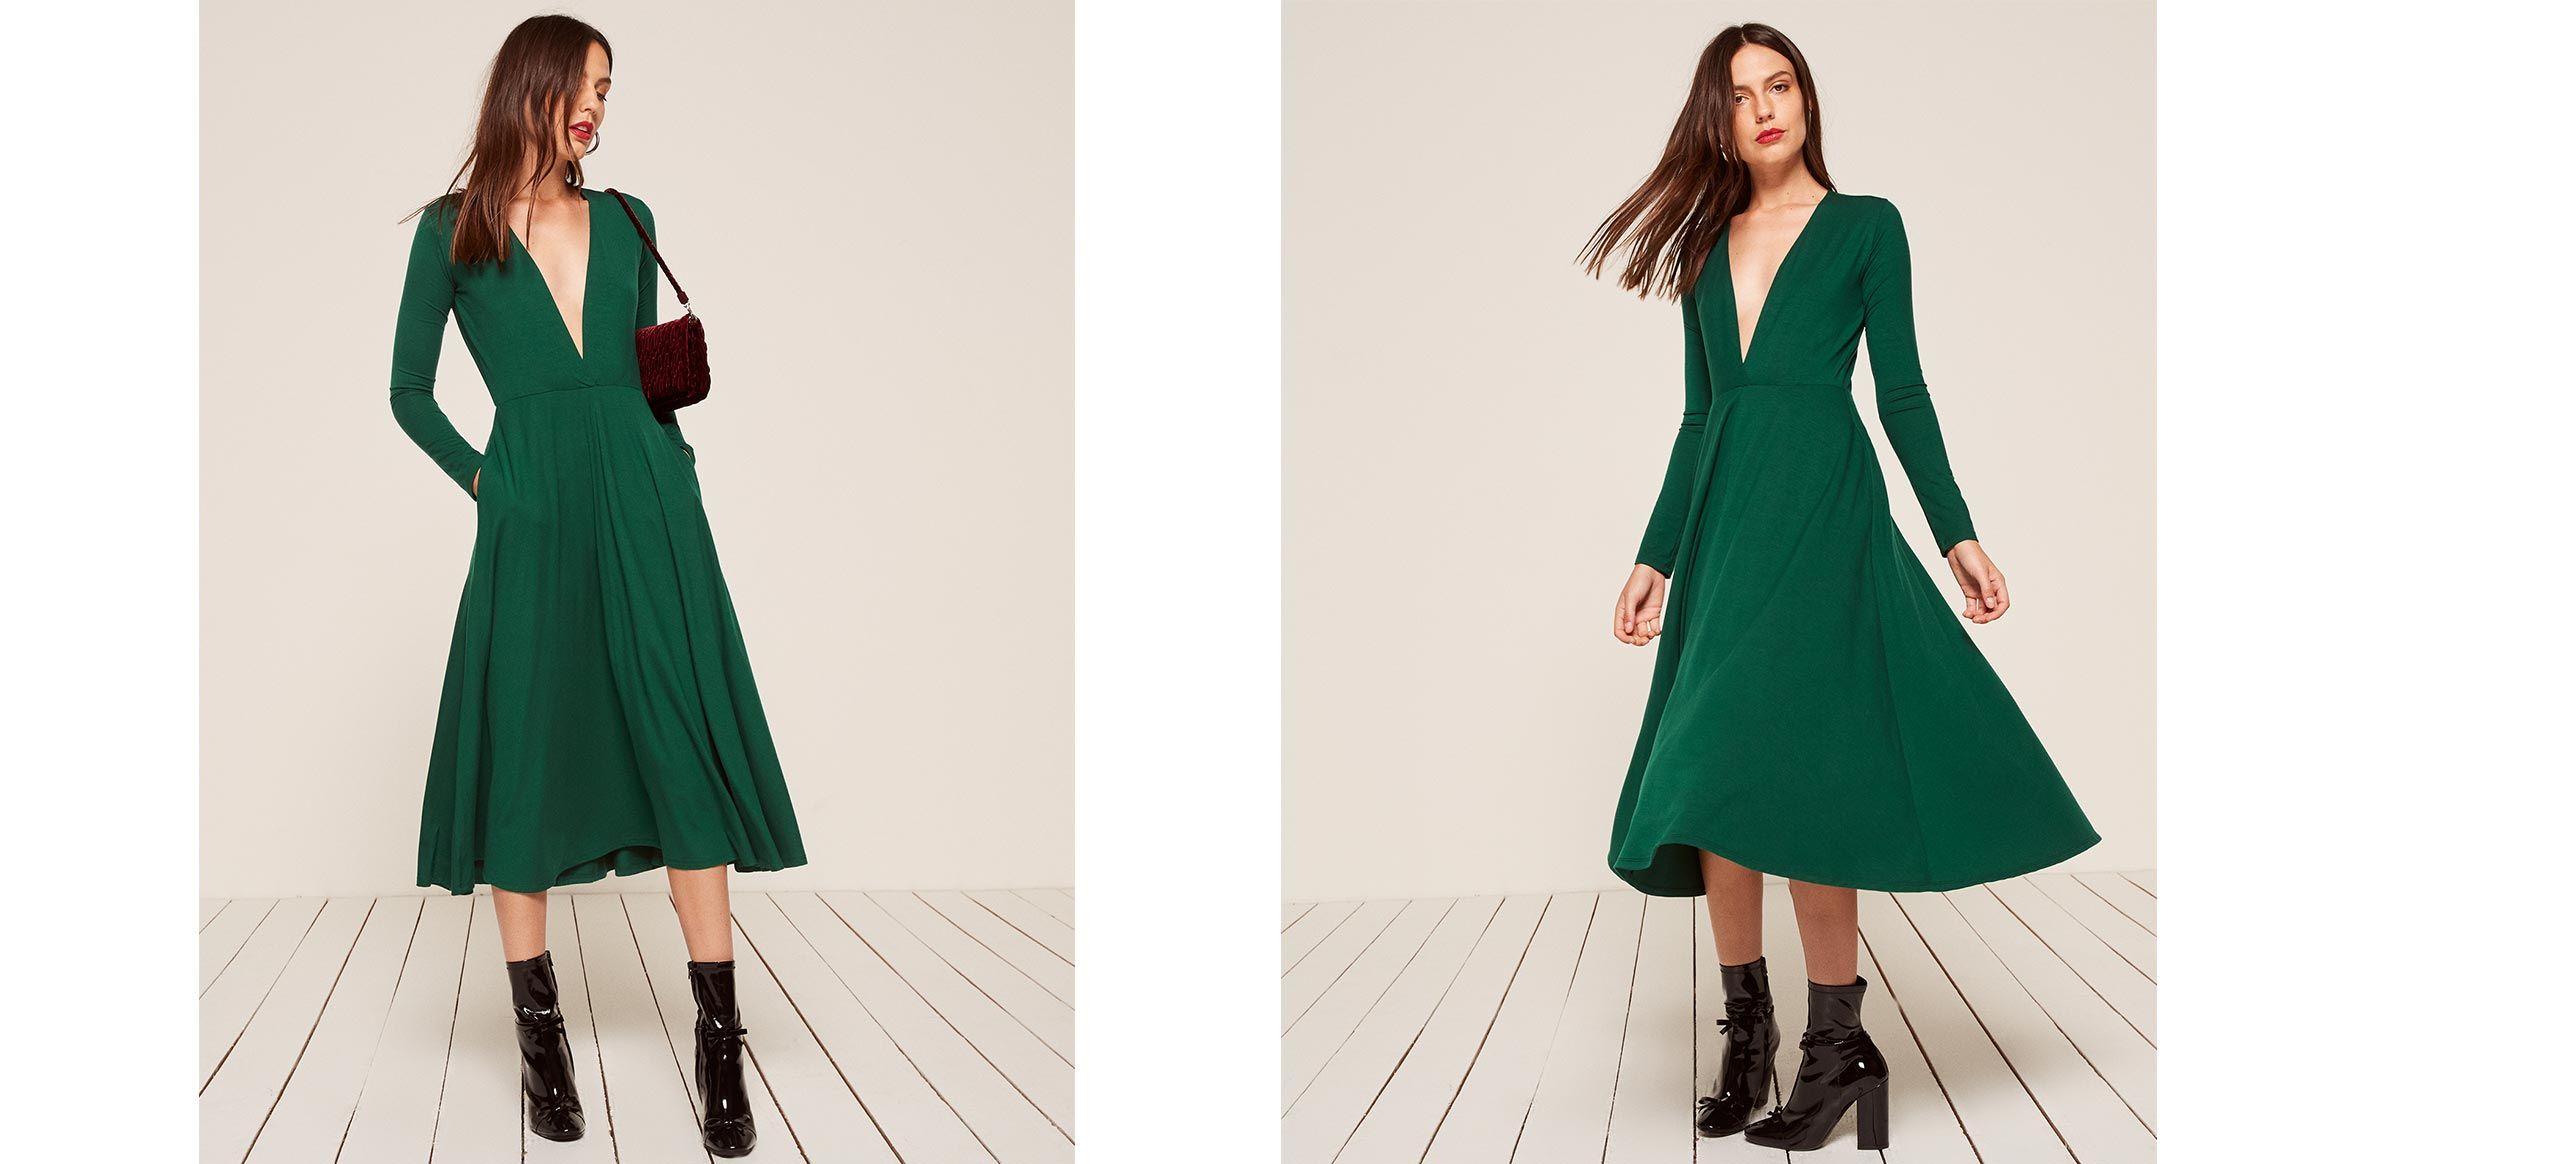 Reyes dress reformation swing skirt and neckline